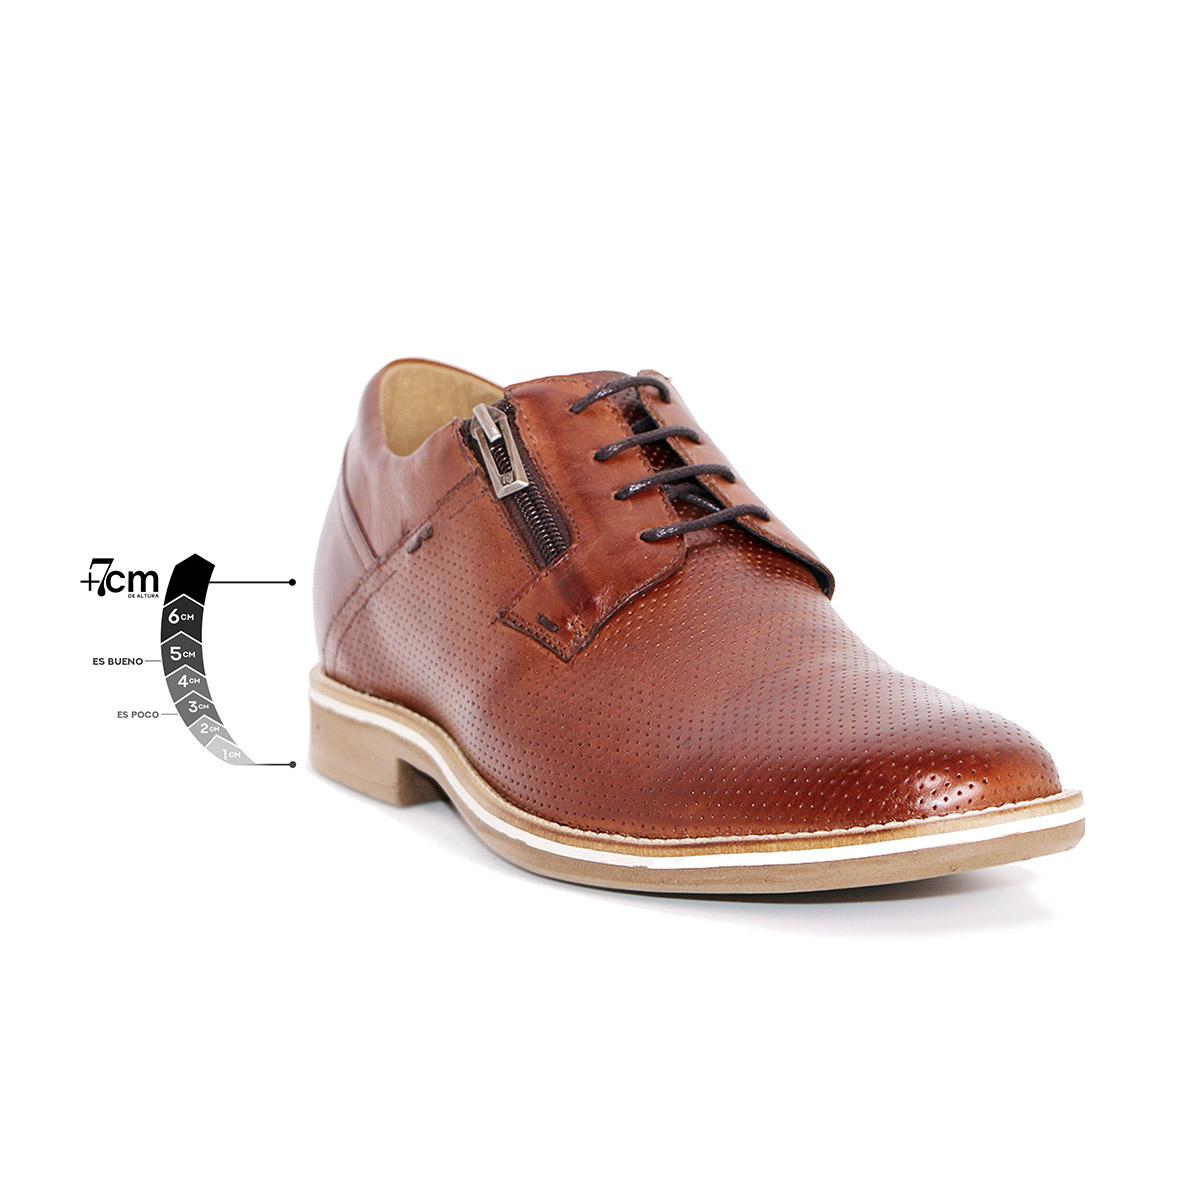 Zapato Casual Break Café Max Denegri +7cms De Altura_75289